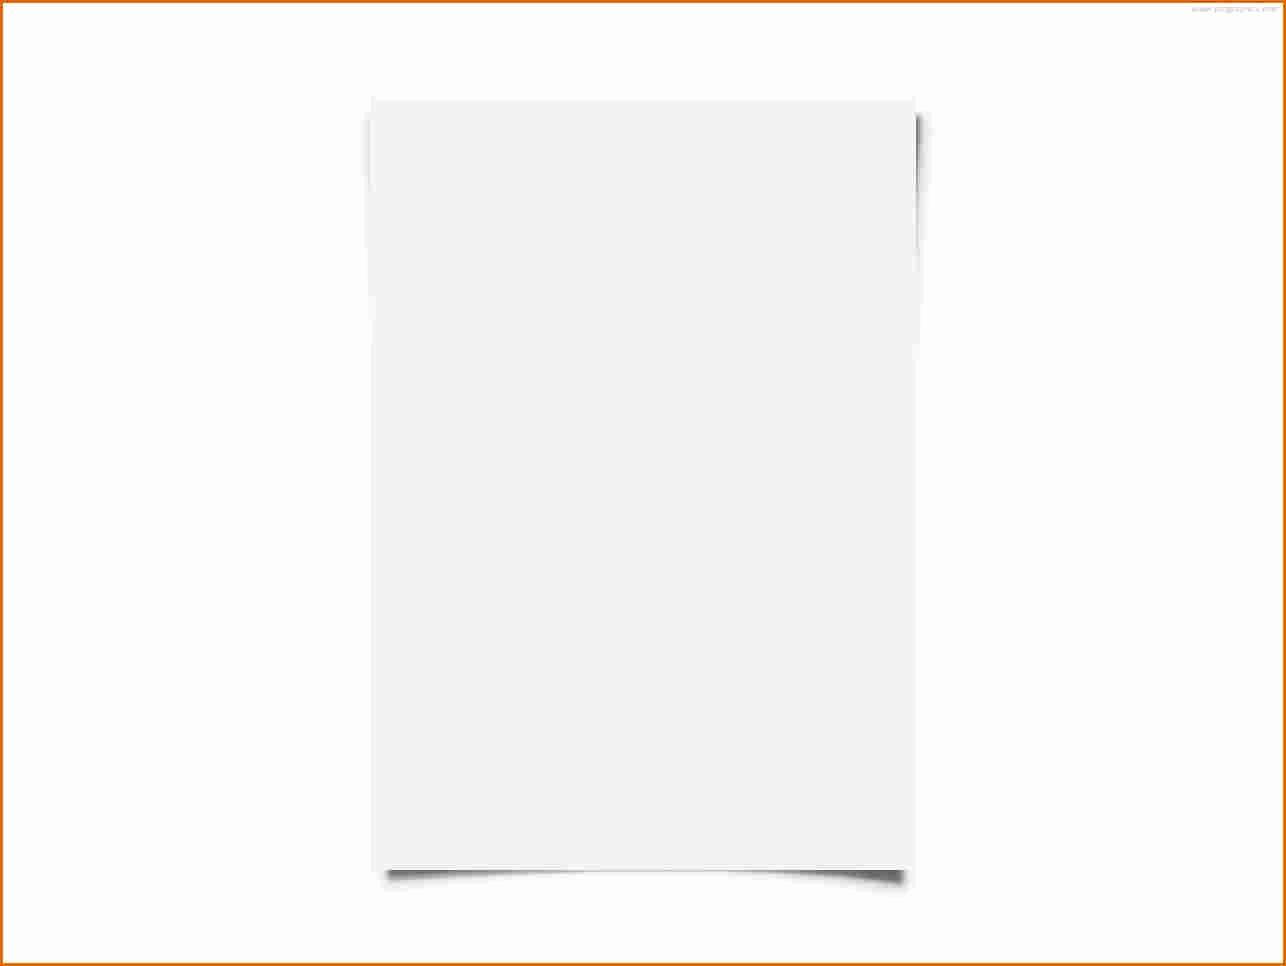 7 White Paper Template